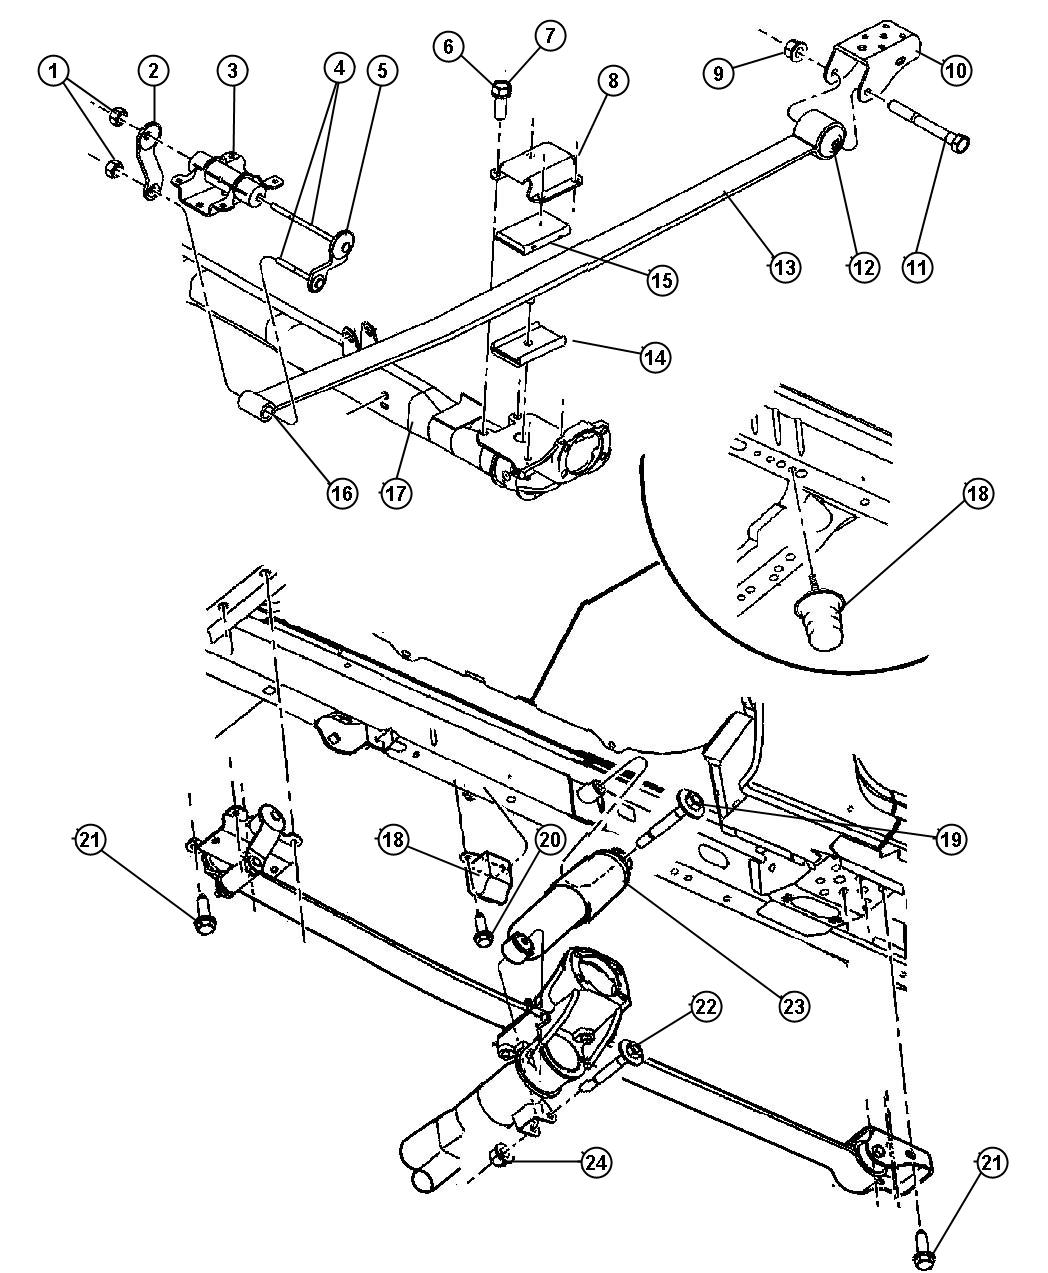 service manual  1998 dodge grand caravan rear differential